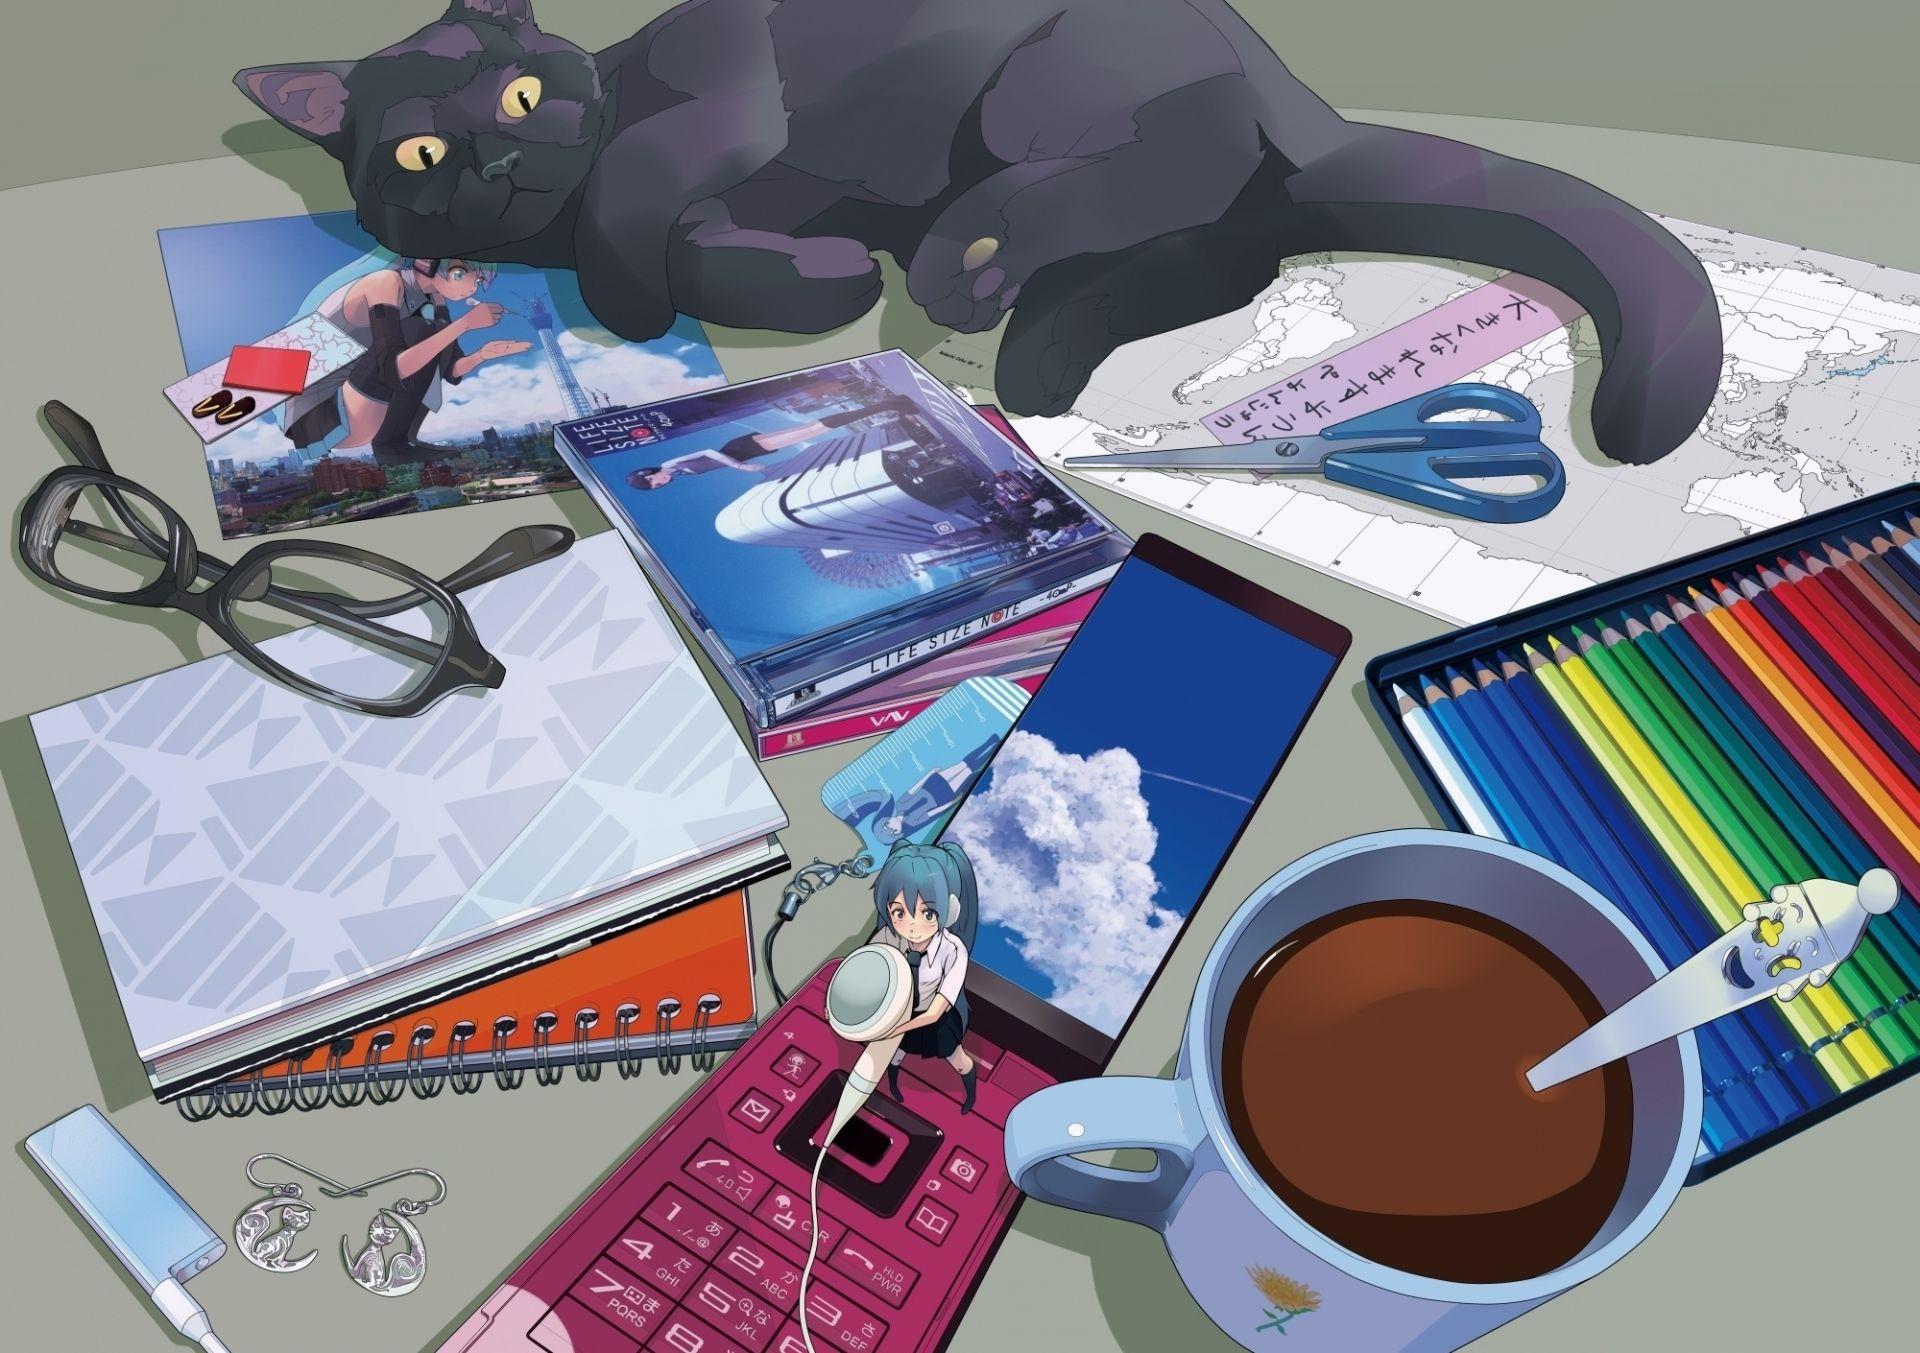 Февраля, аниме картинки на телефон обои